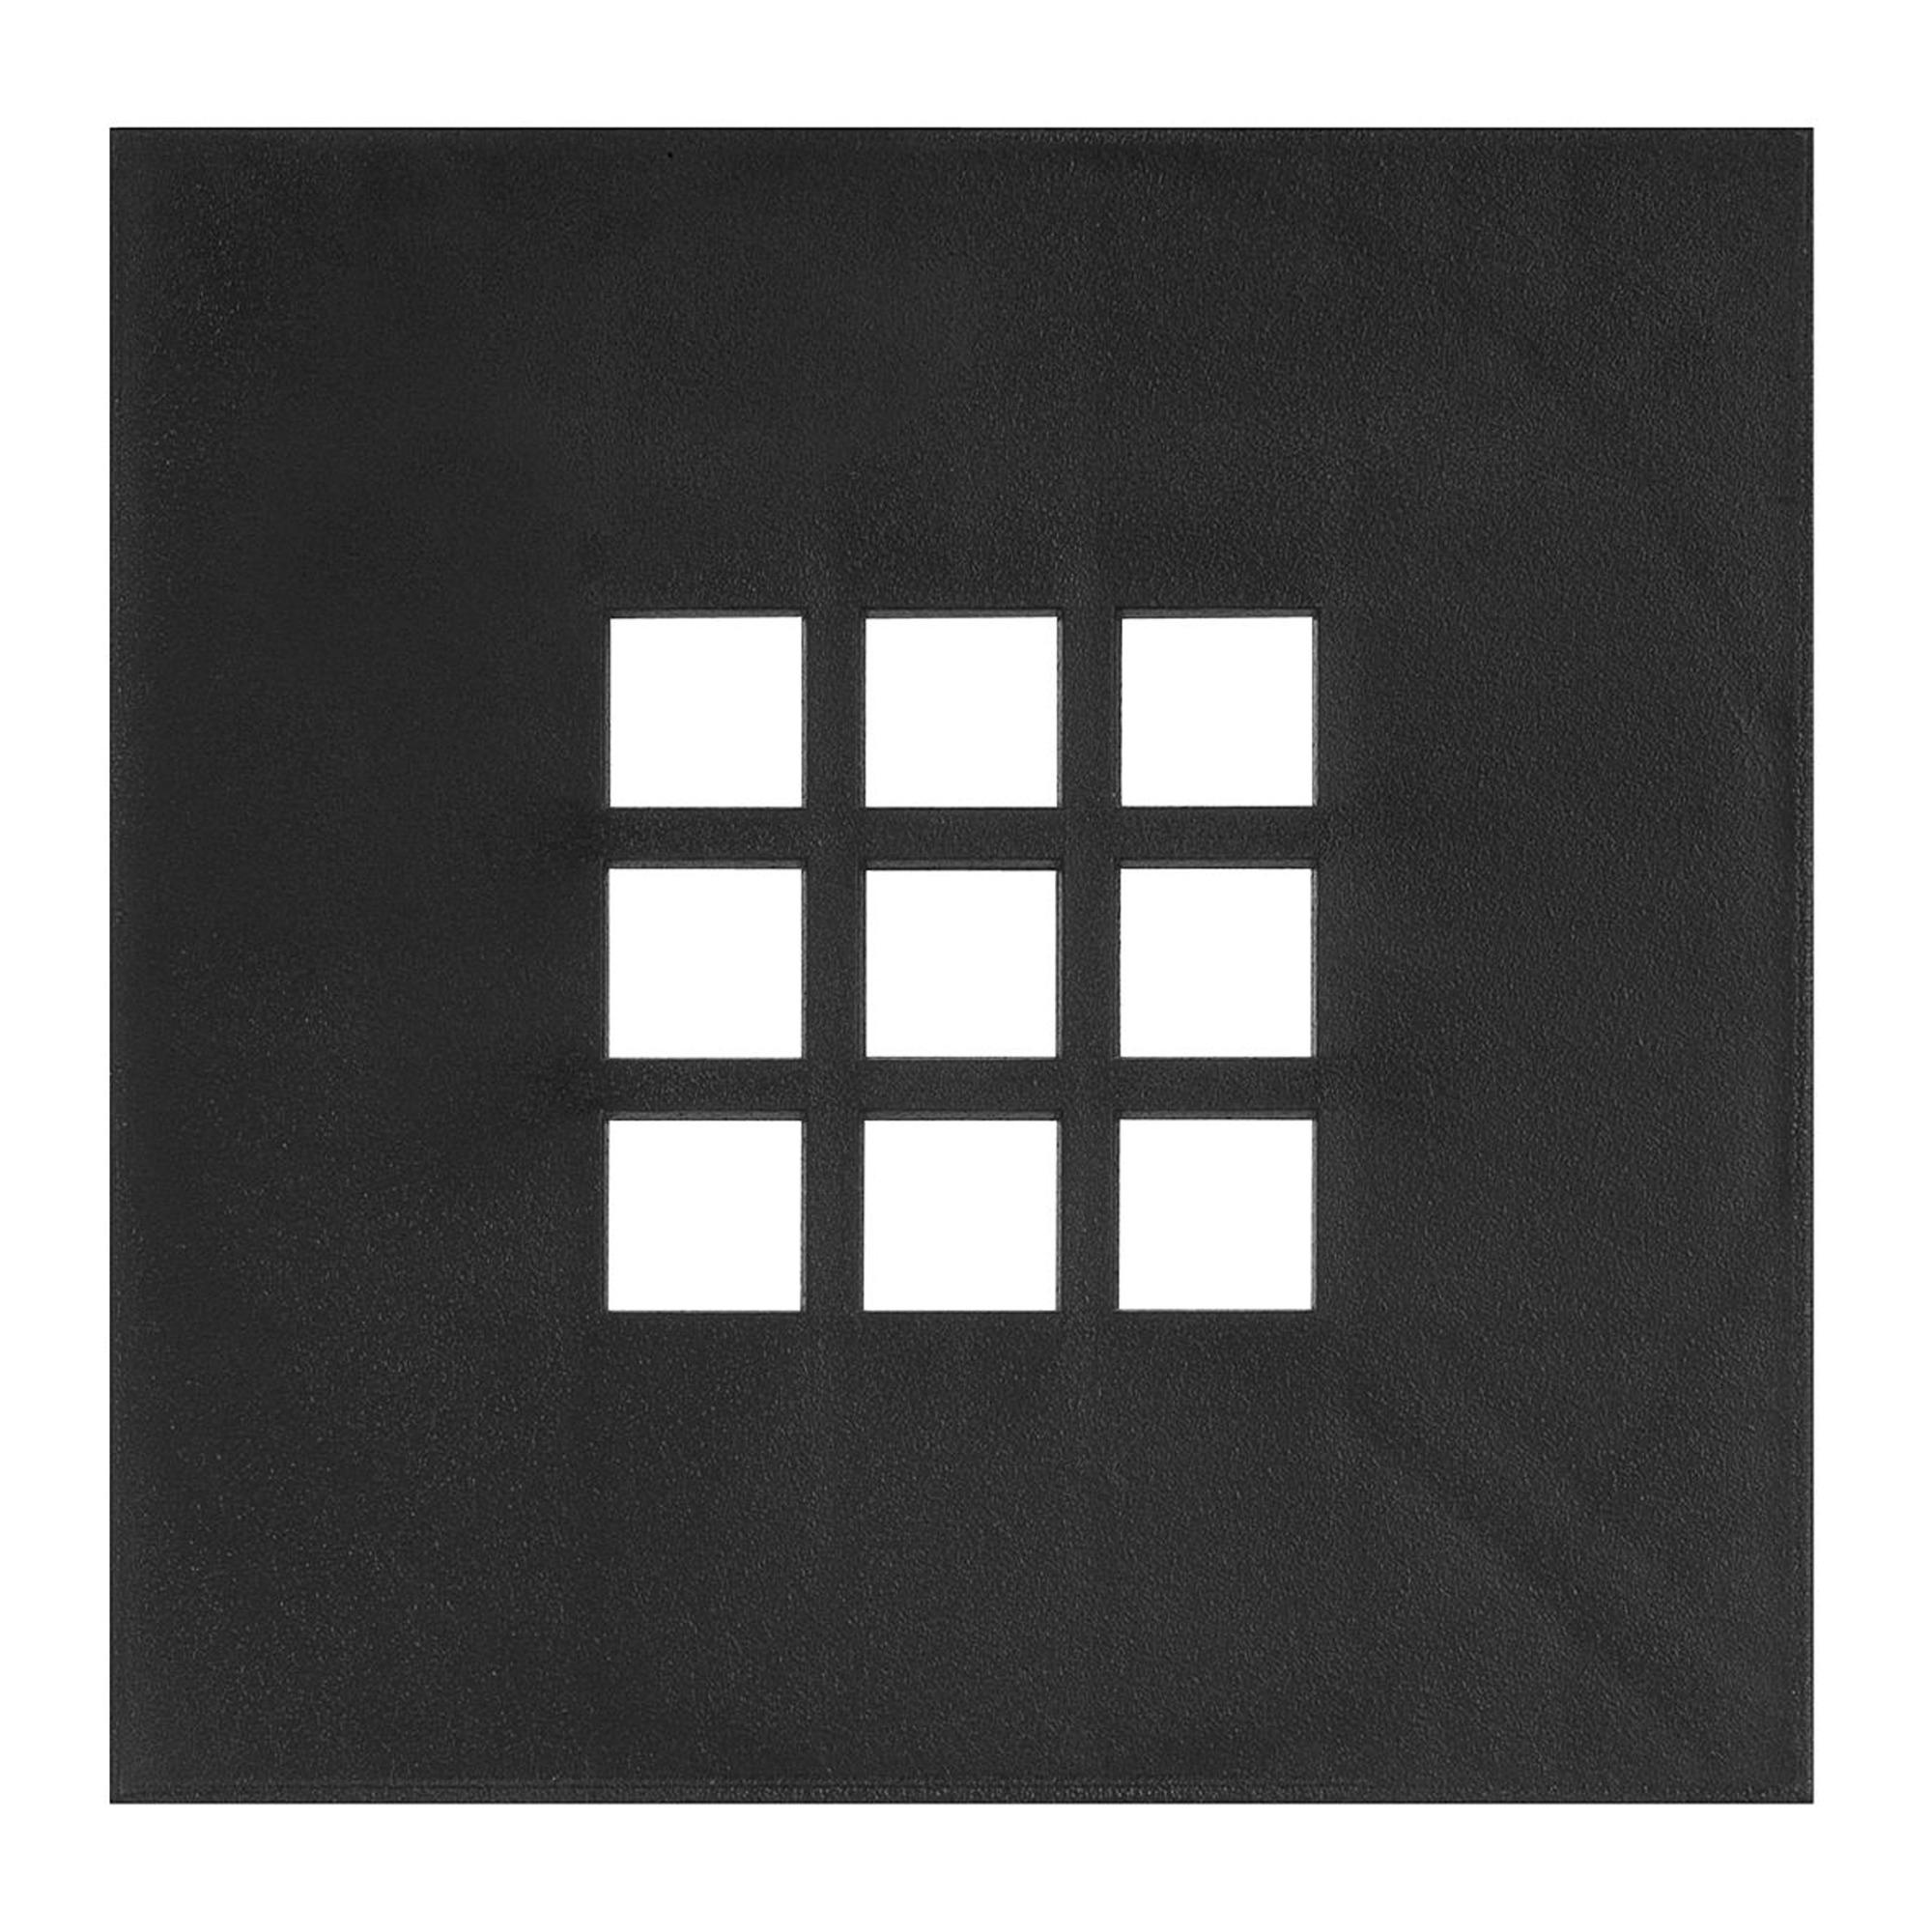 Martens deksel kunststof 20x20cm w-flex put